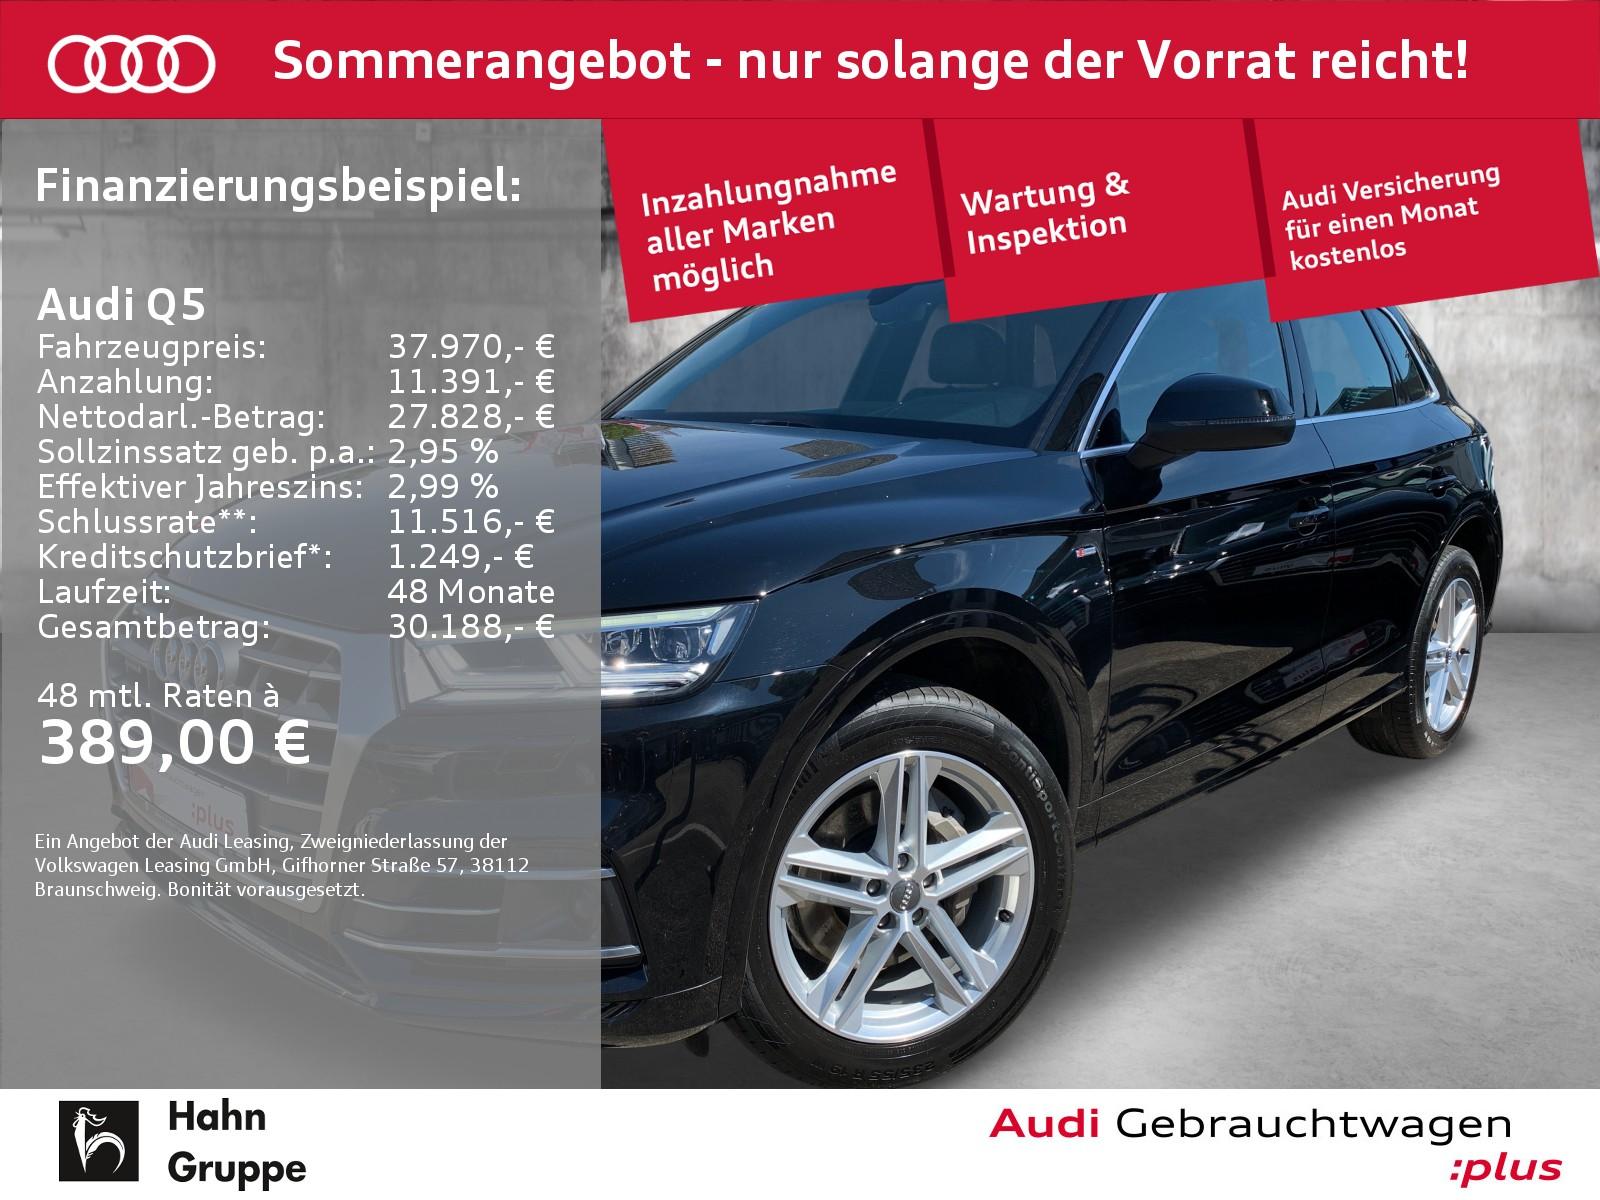 Audi Q5 2.0 TFSI qua. S-trc S-line Navi LED AHK CAM, Jahr 2018, Benzin